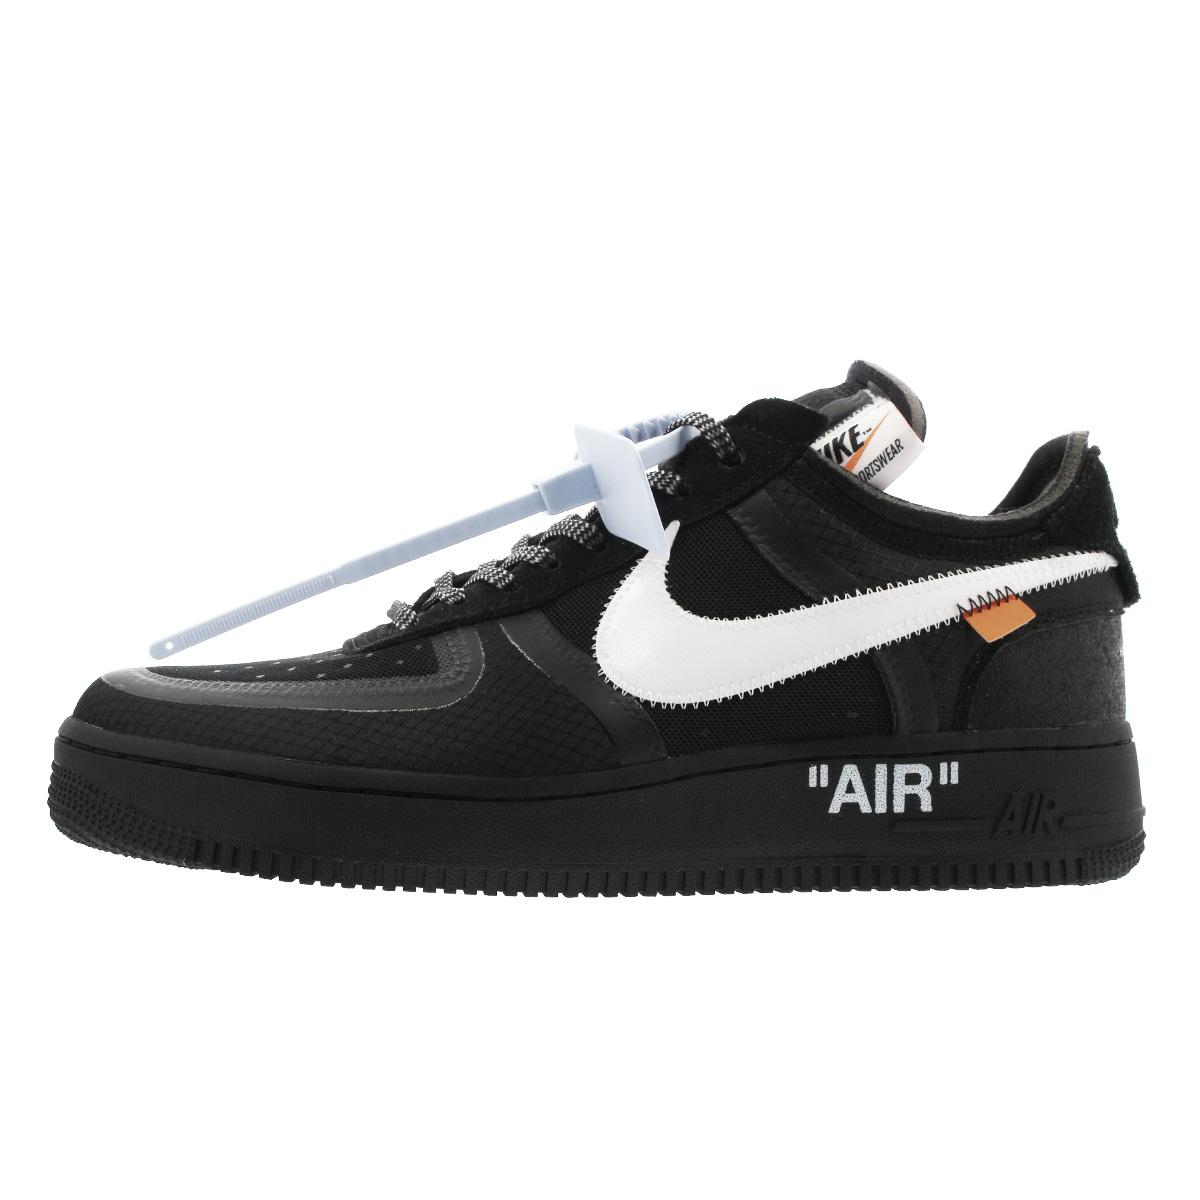 air force 1 per off white